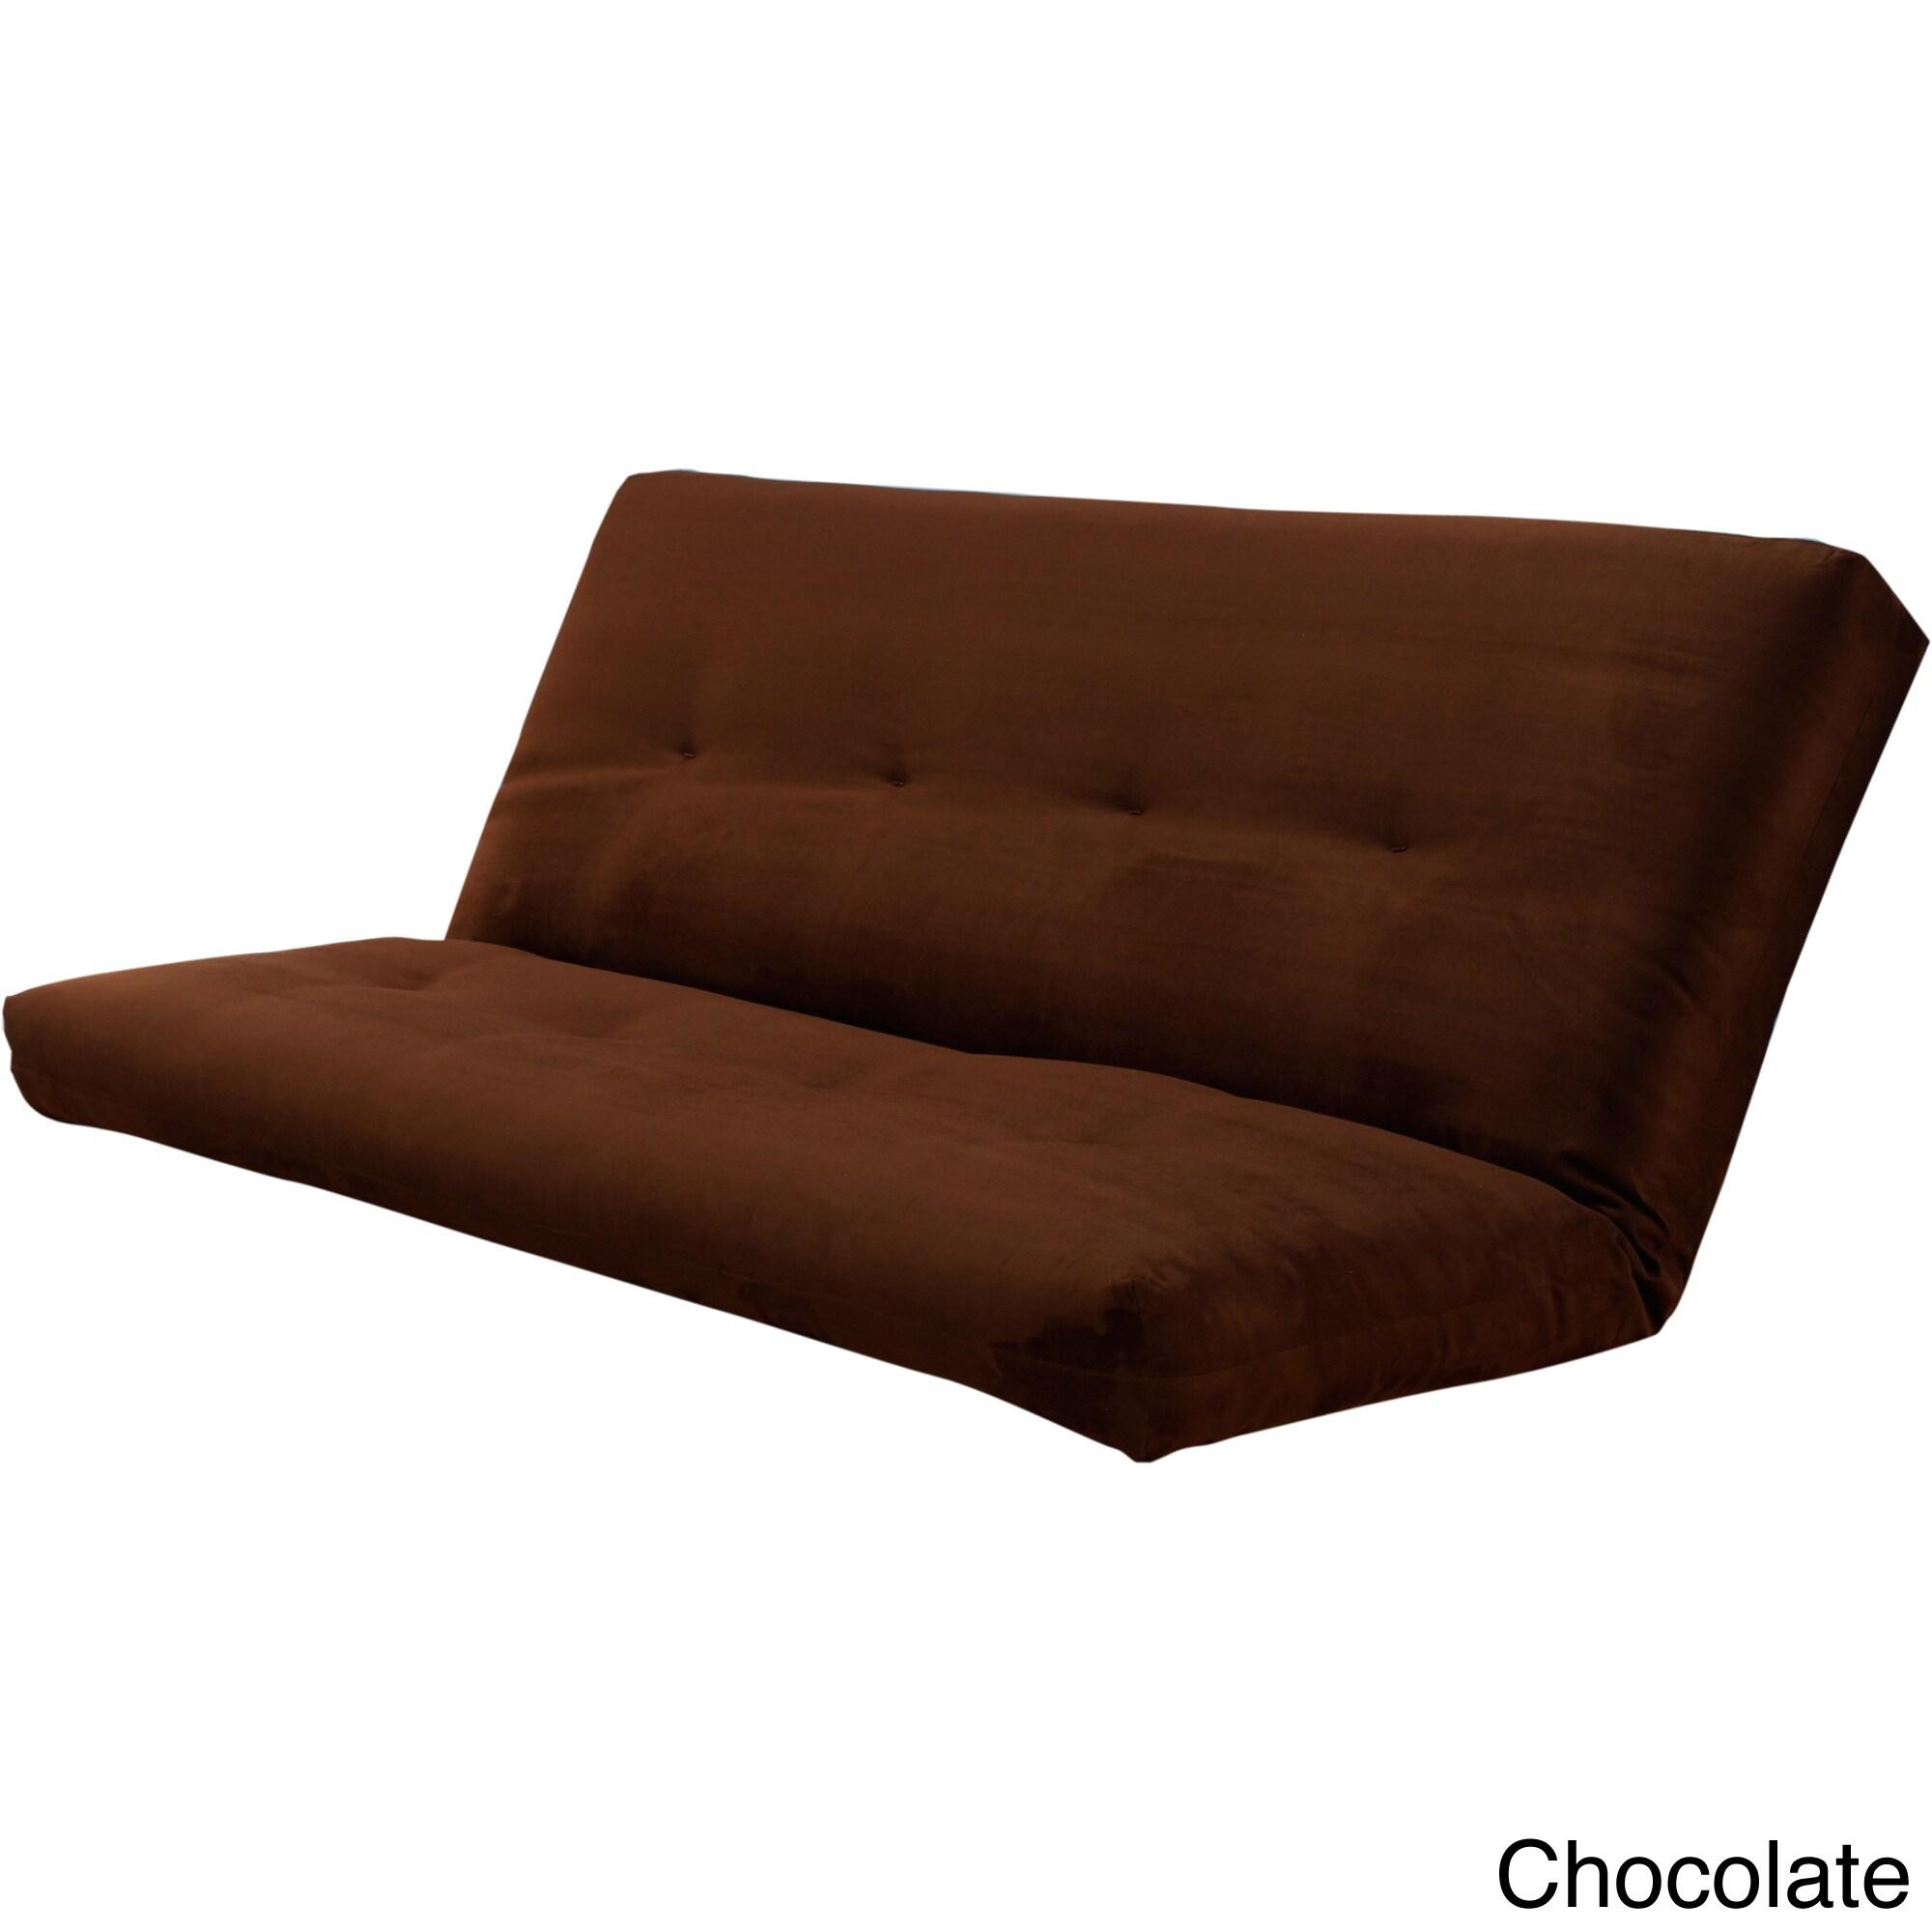 twin master beatnikfutoncover cover futons futon beatnik hayneedle cfm product